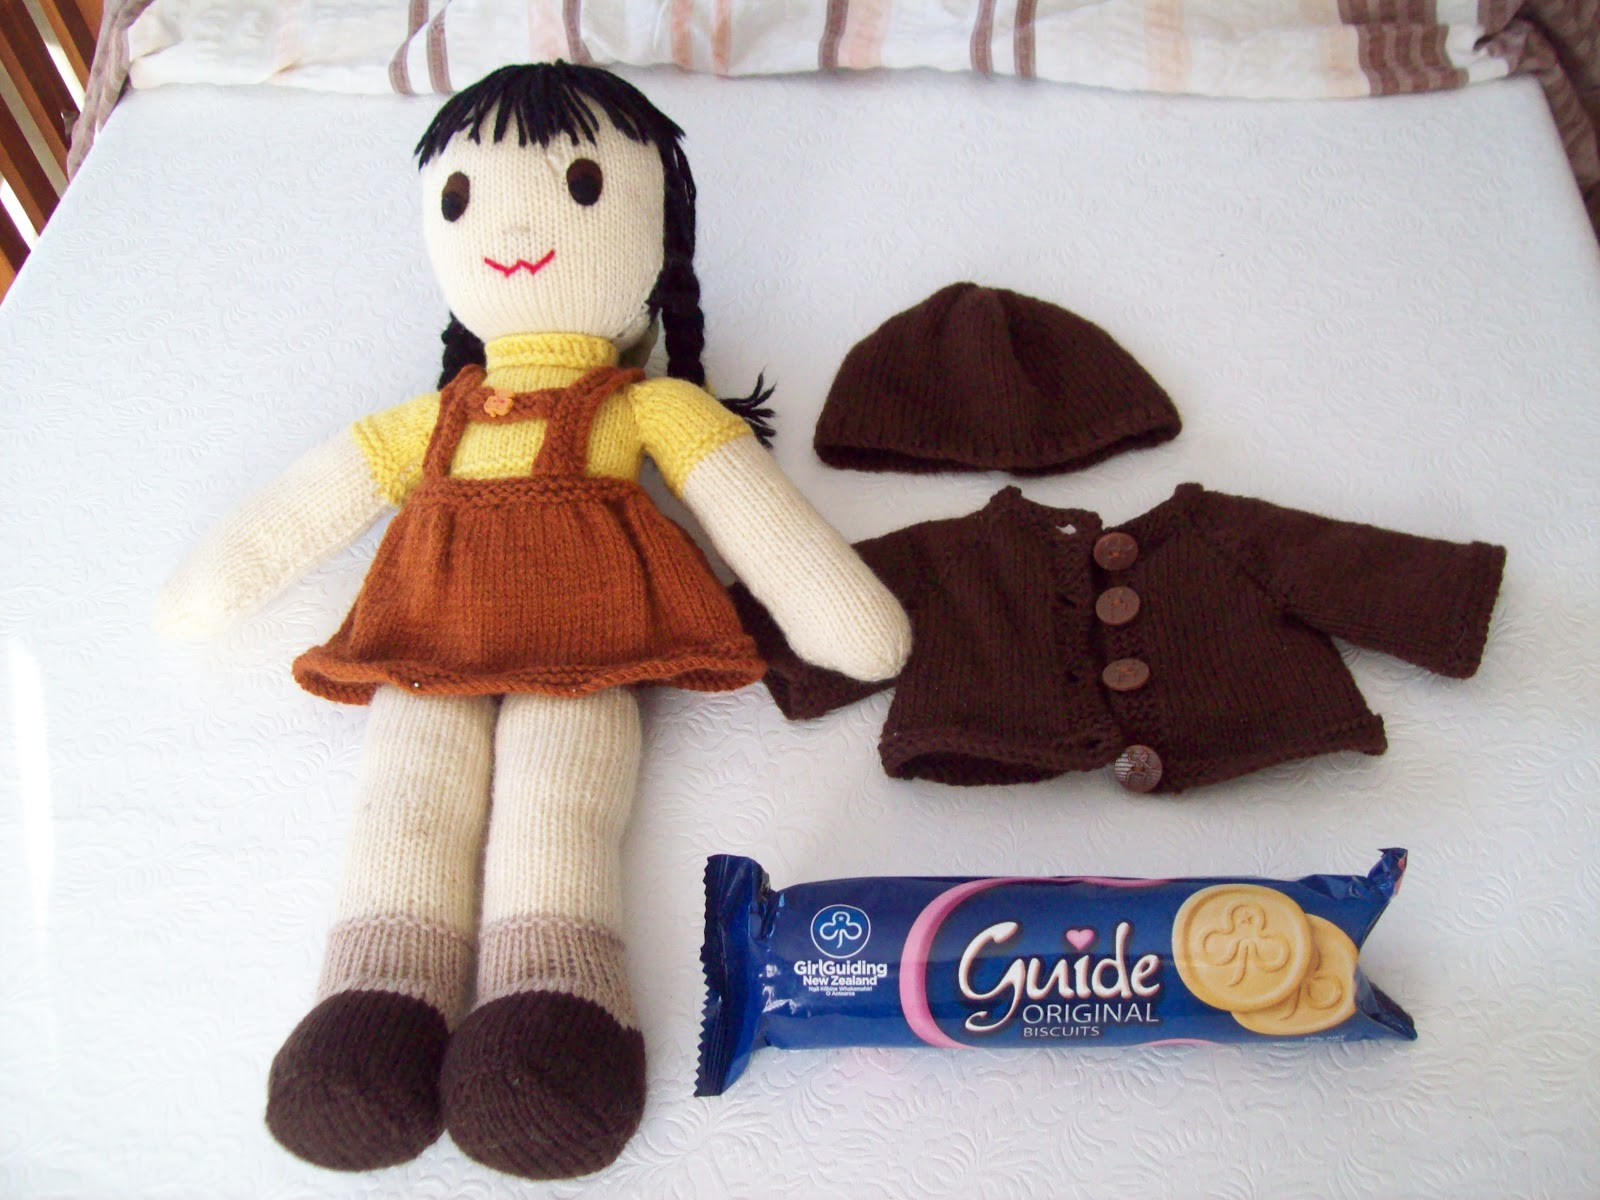 Kowhai Corner Ginny Doll and Friends: NZ Brownie Uniforms